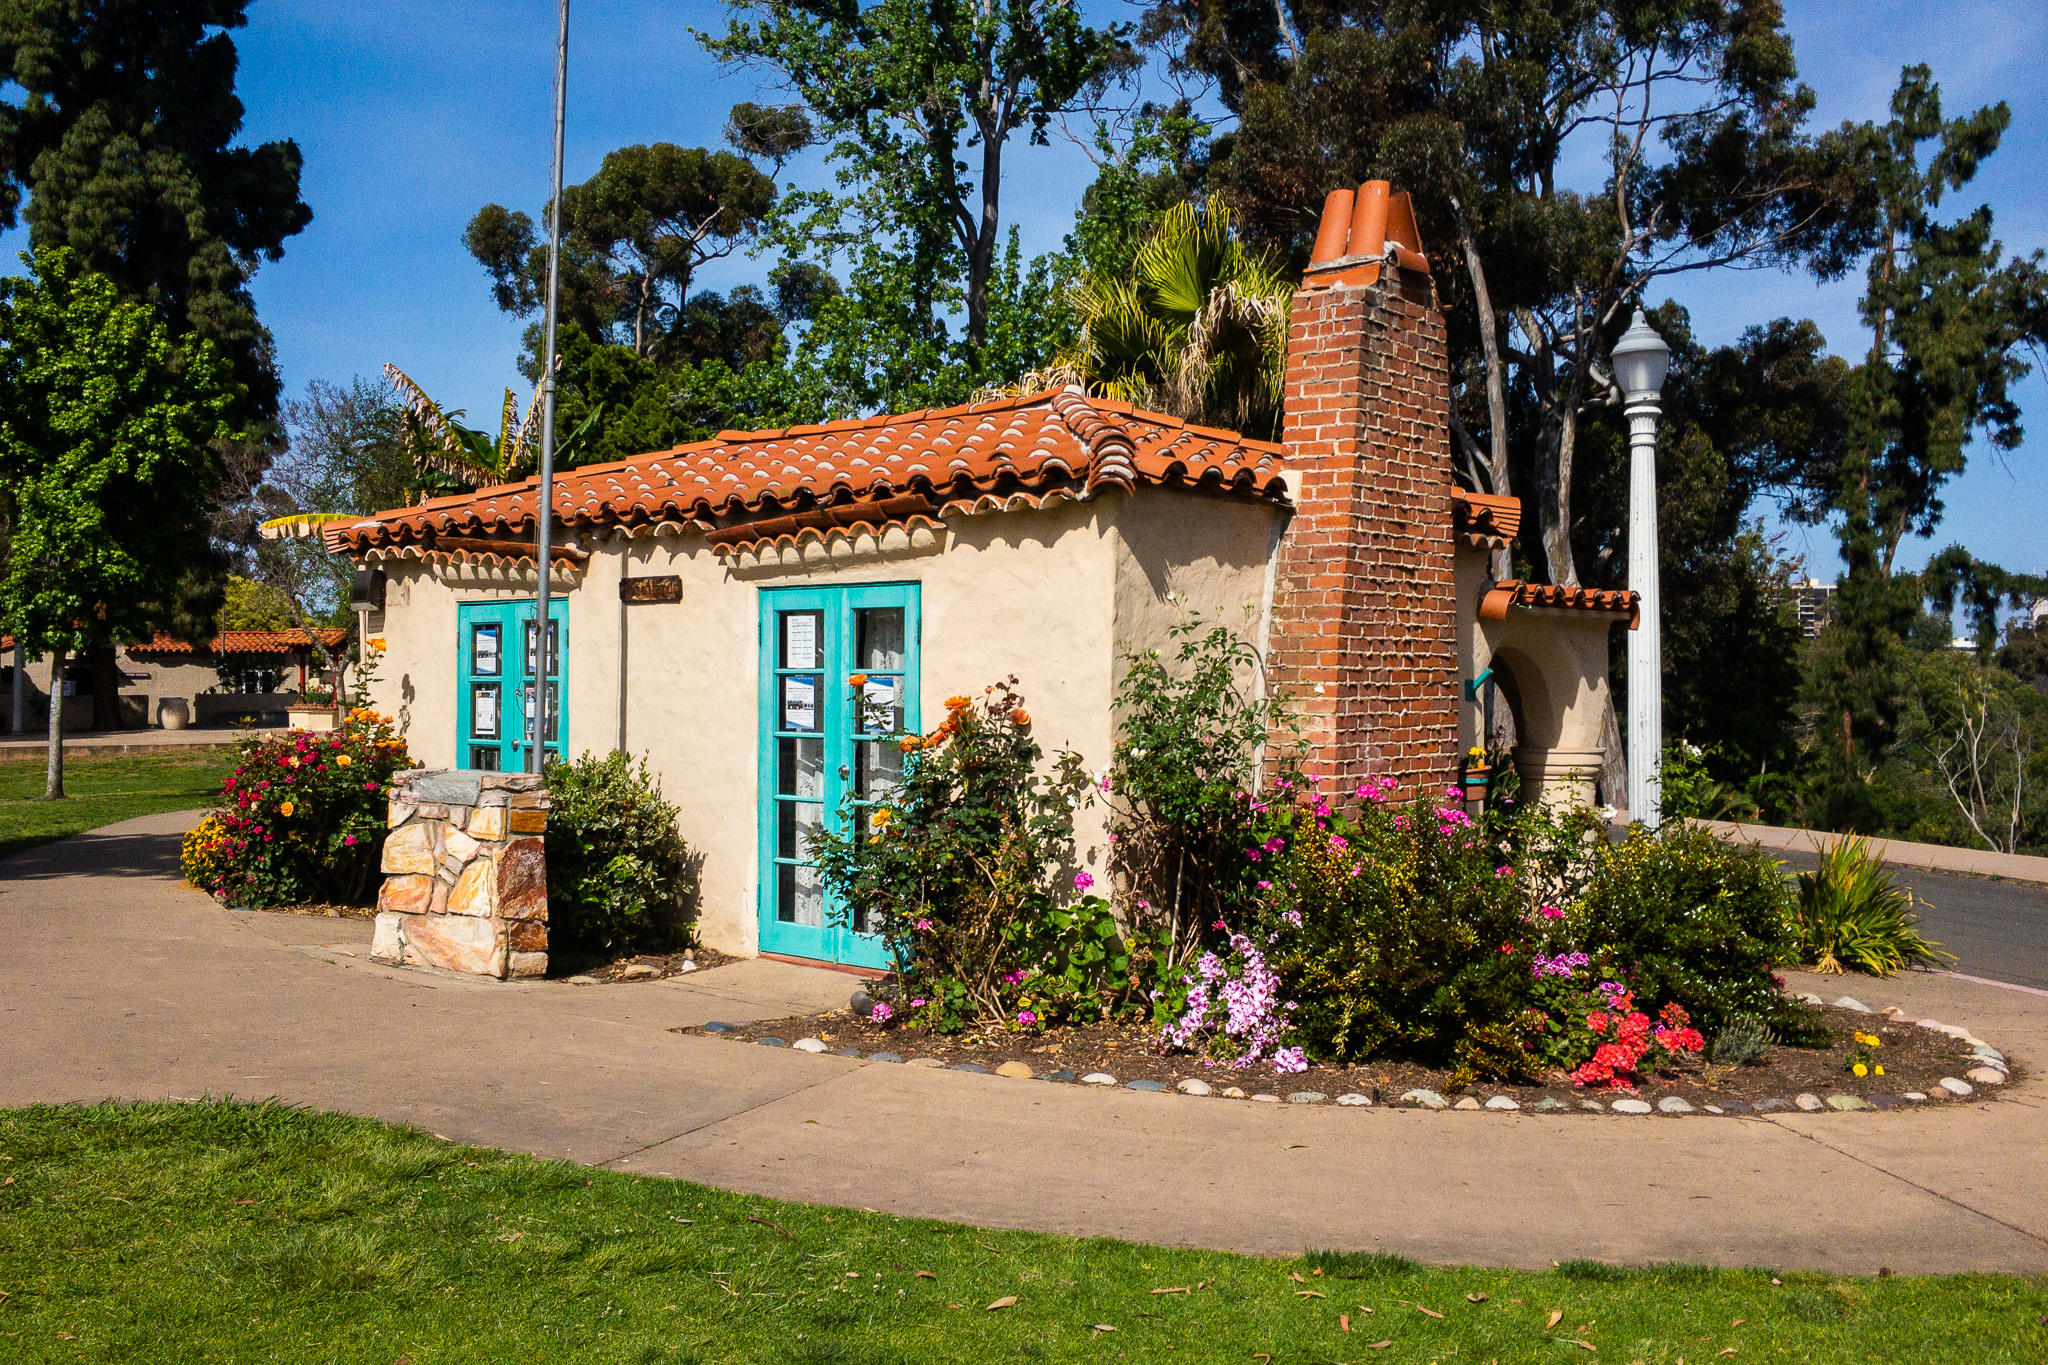 International Houses Balboa Park